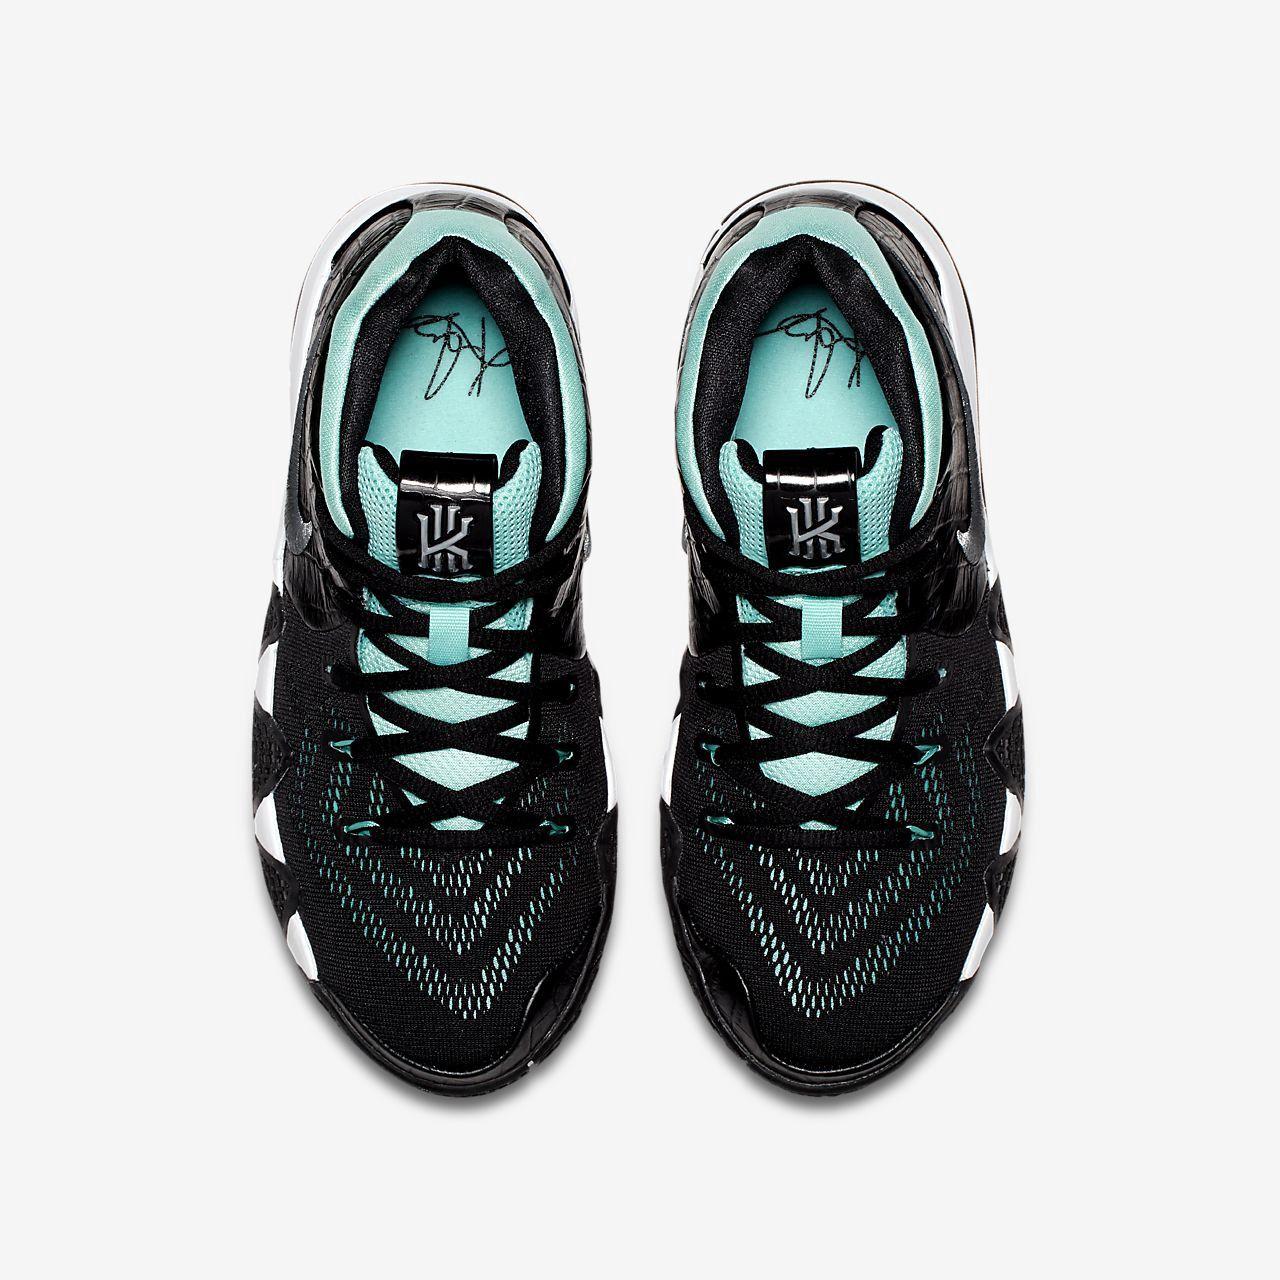 8cc0fd5704e Nike Kyrie 4 Big Kids  Basketball Shoe - 5.5Y Silver